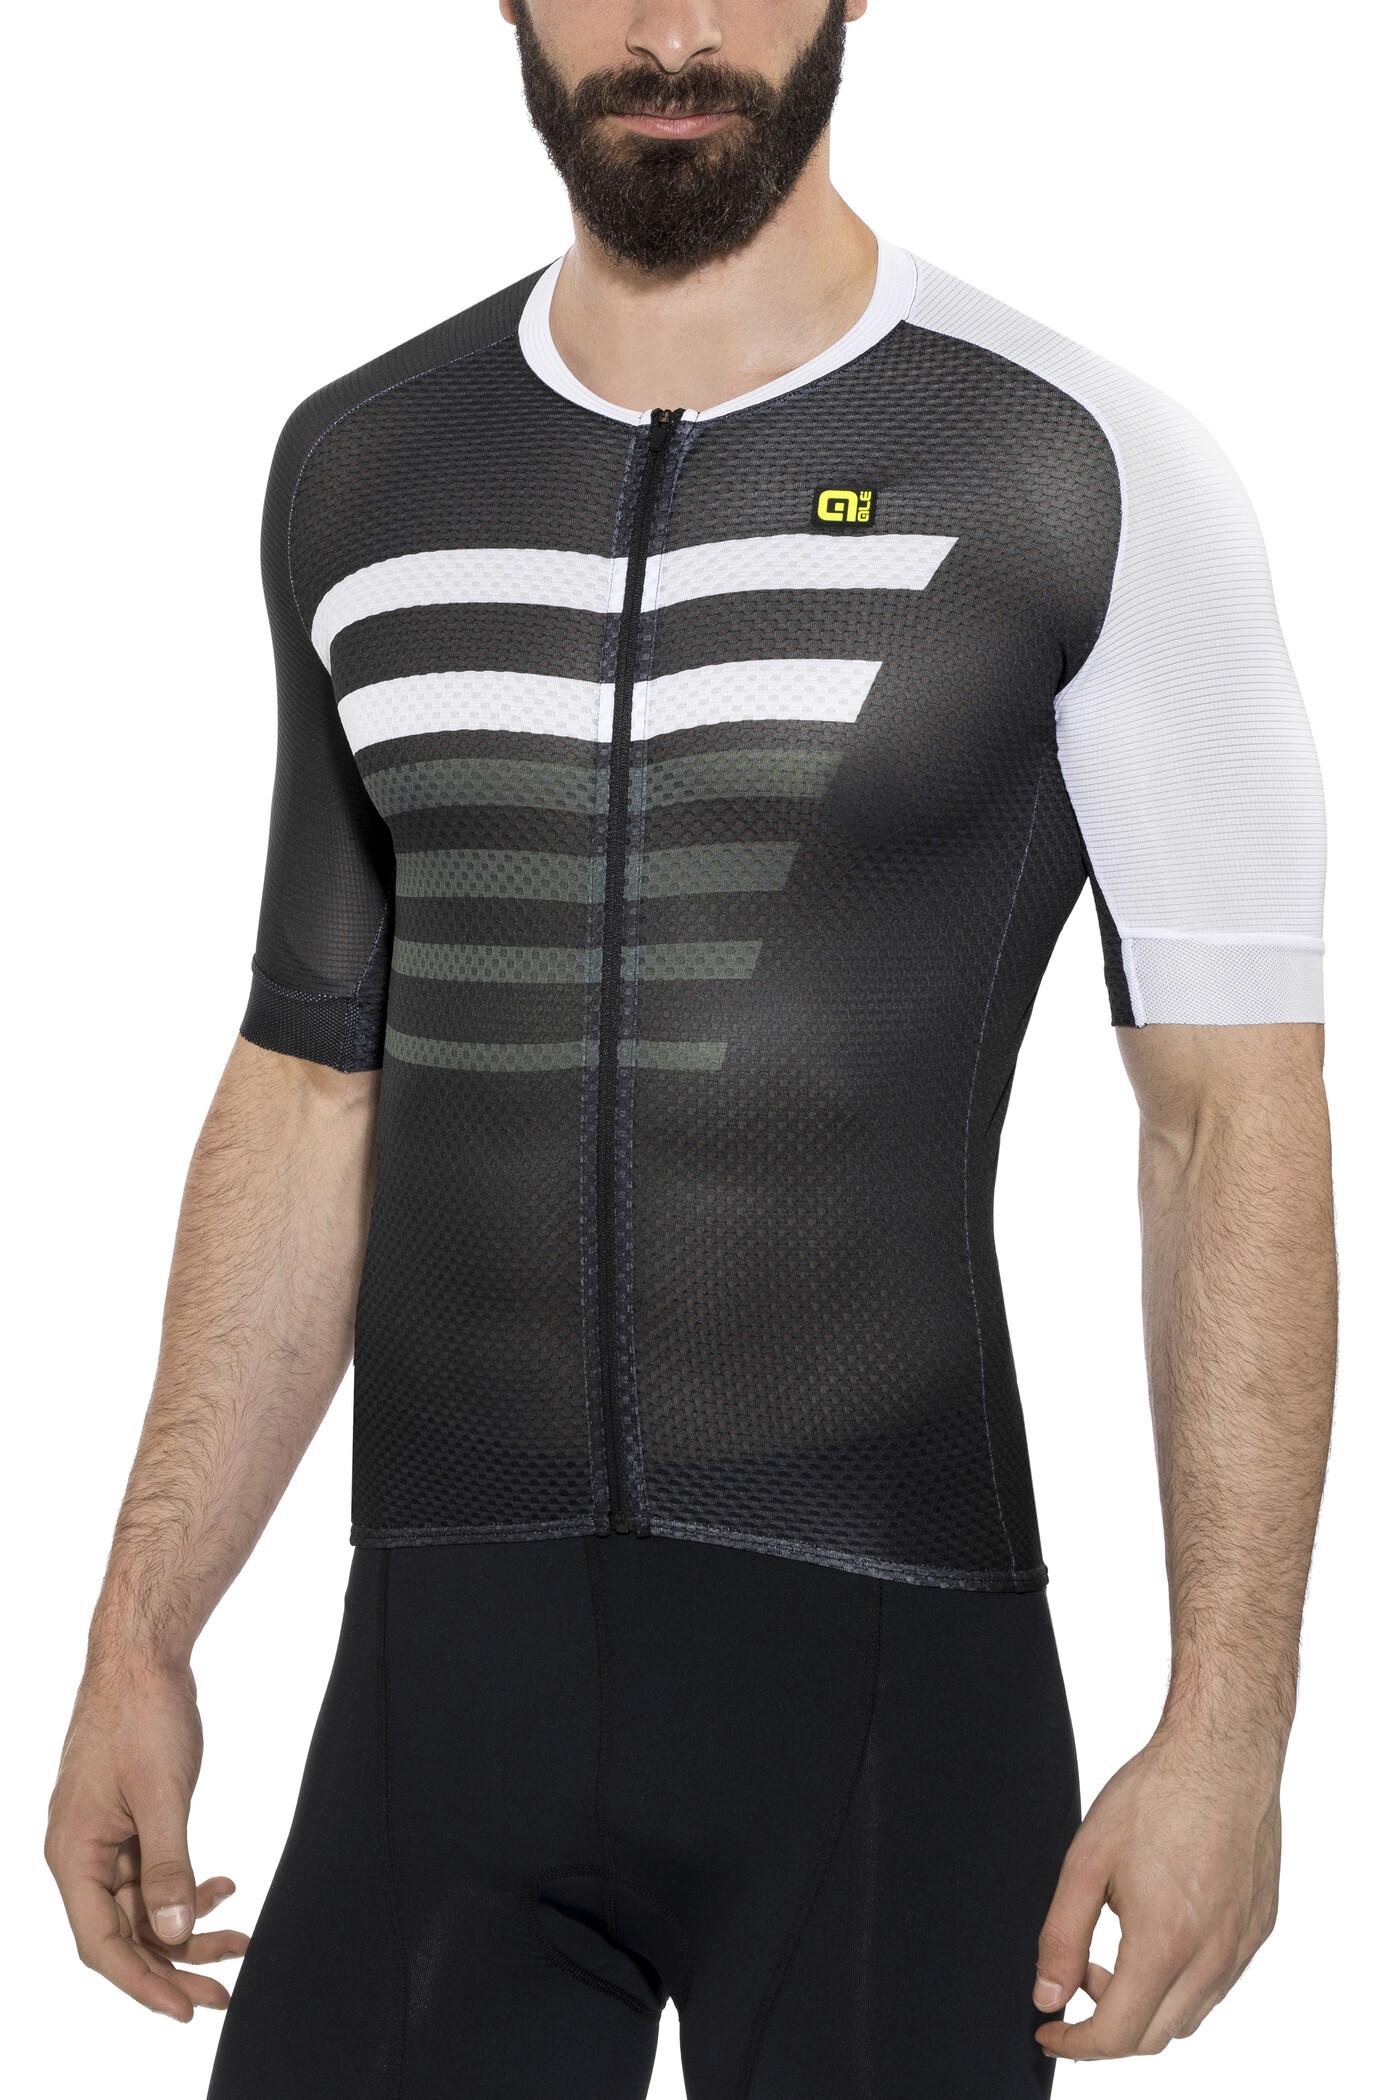 Alé Cycling PRR 2.0 Piuma Kortærmet cykeltrøje Herrer, black-white | Trøjer